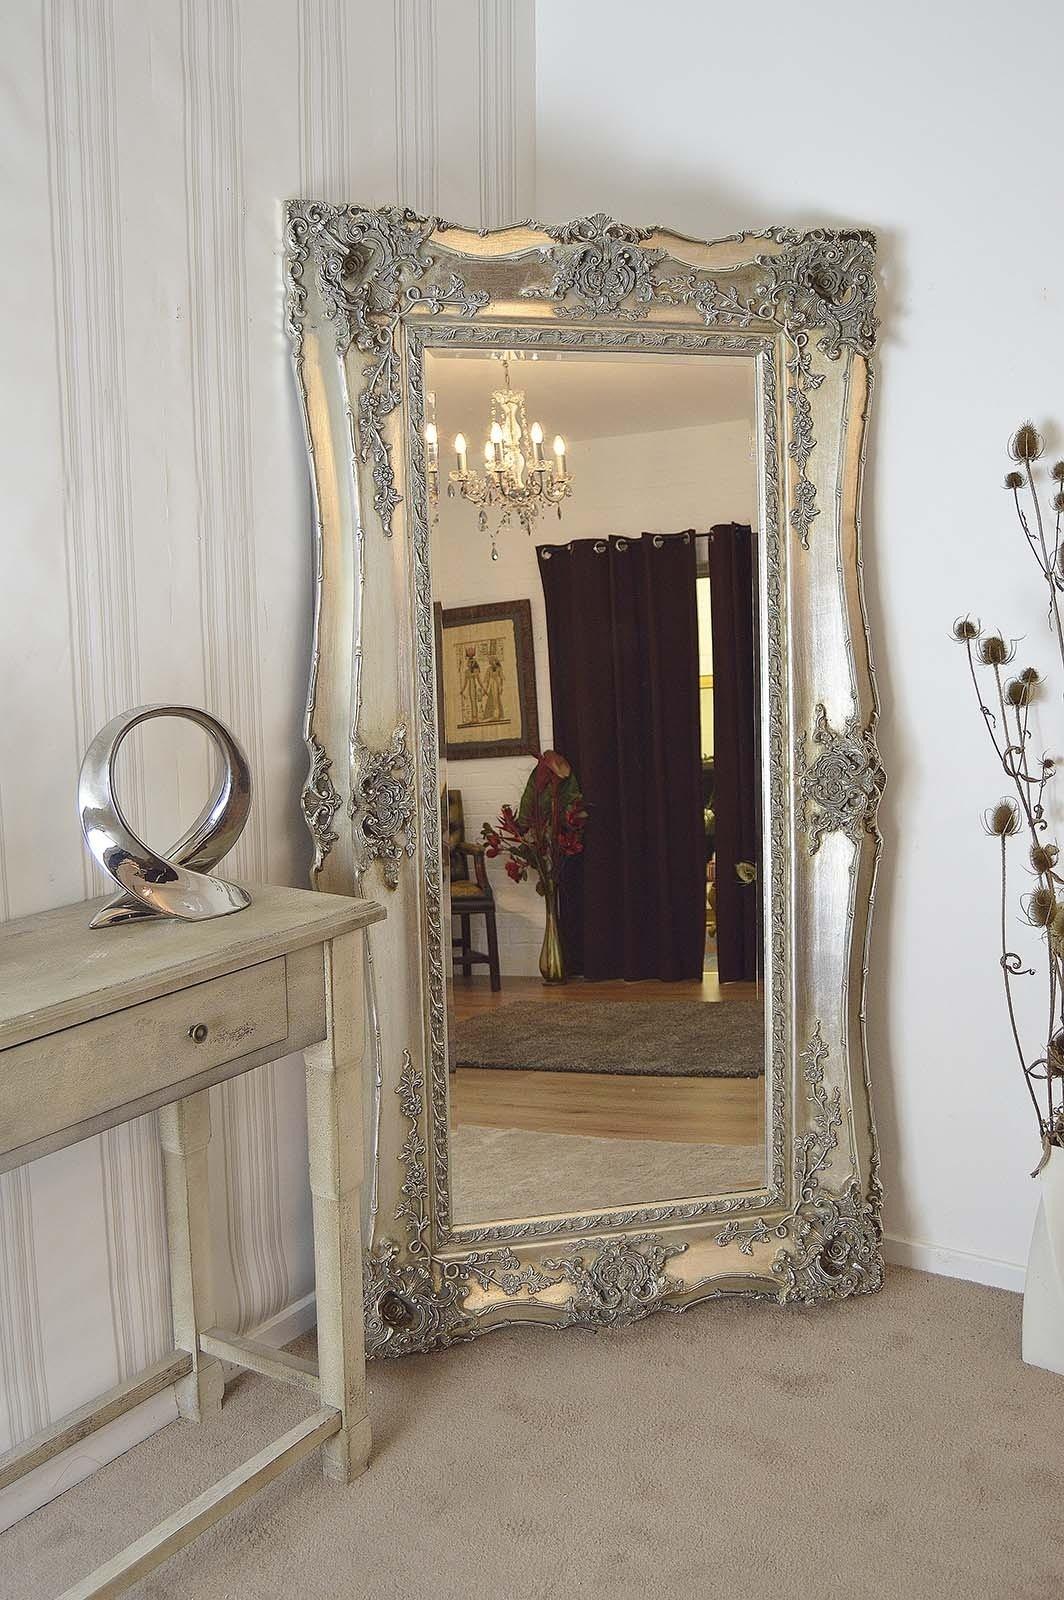 Huge Full Length Wall Mirror Huge Full Length Wall Mirror flooring impressive ornate floorror photo design best ideas 1064 X 1600